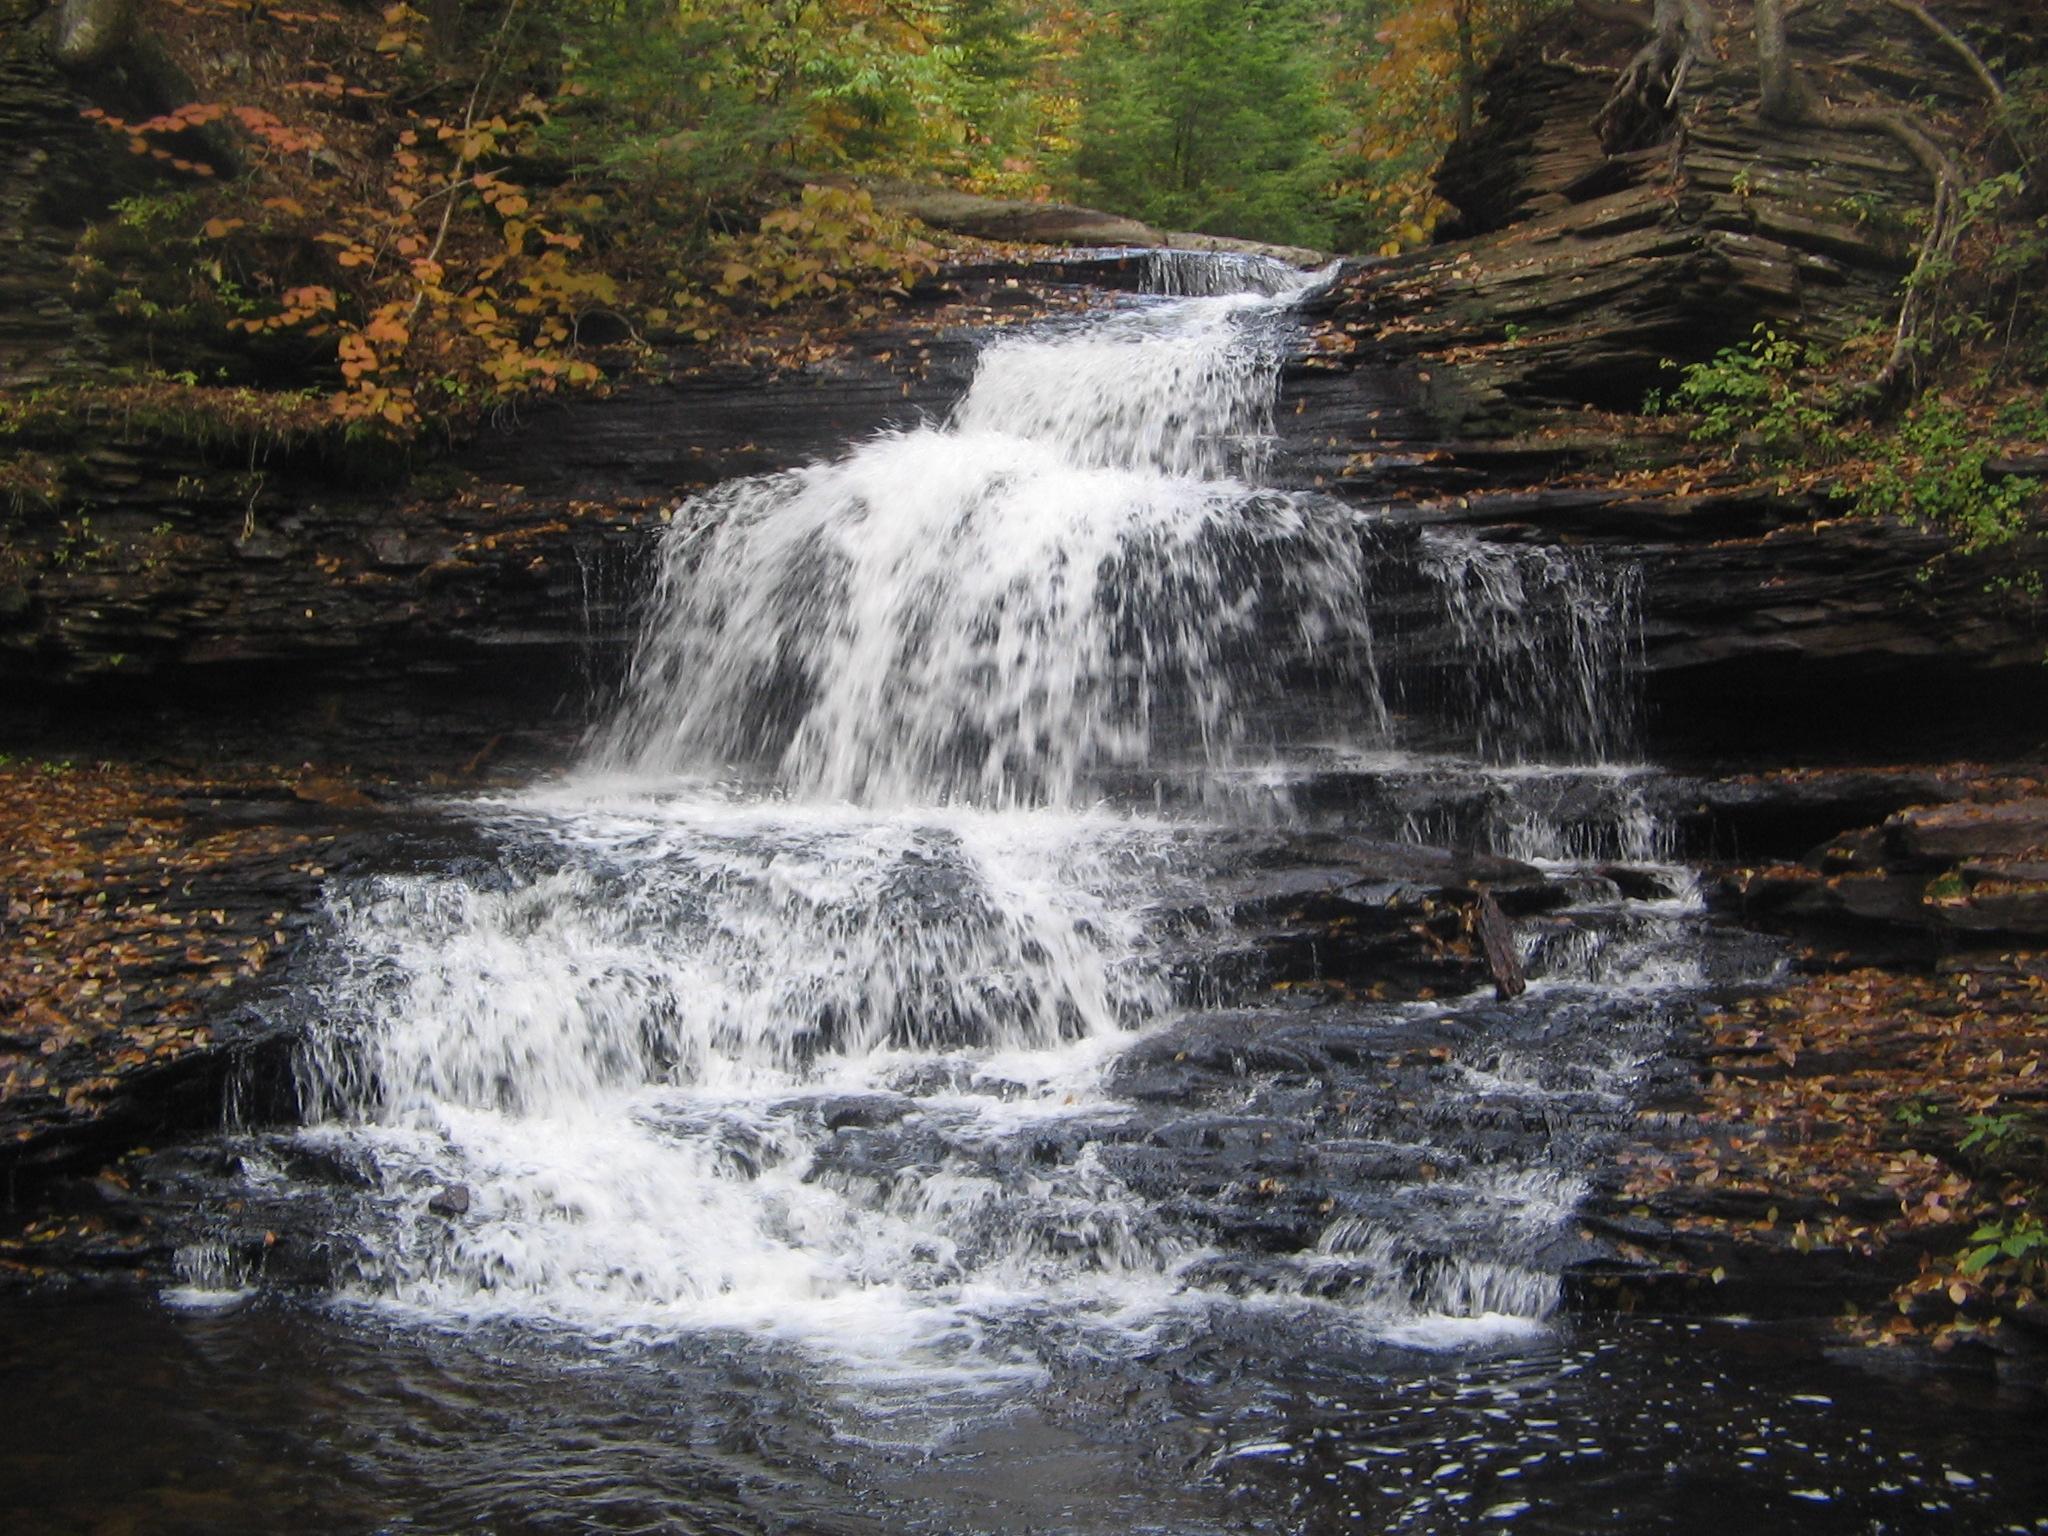 Onondaga falls photo